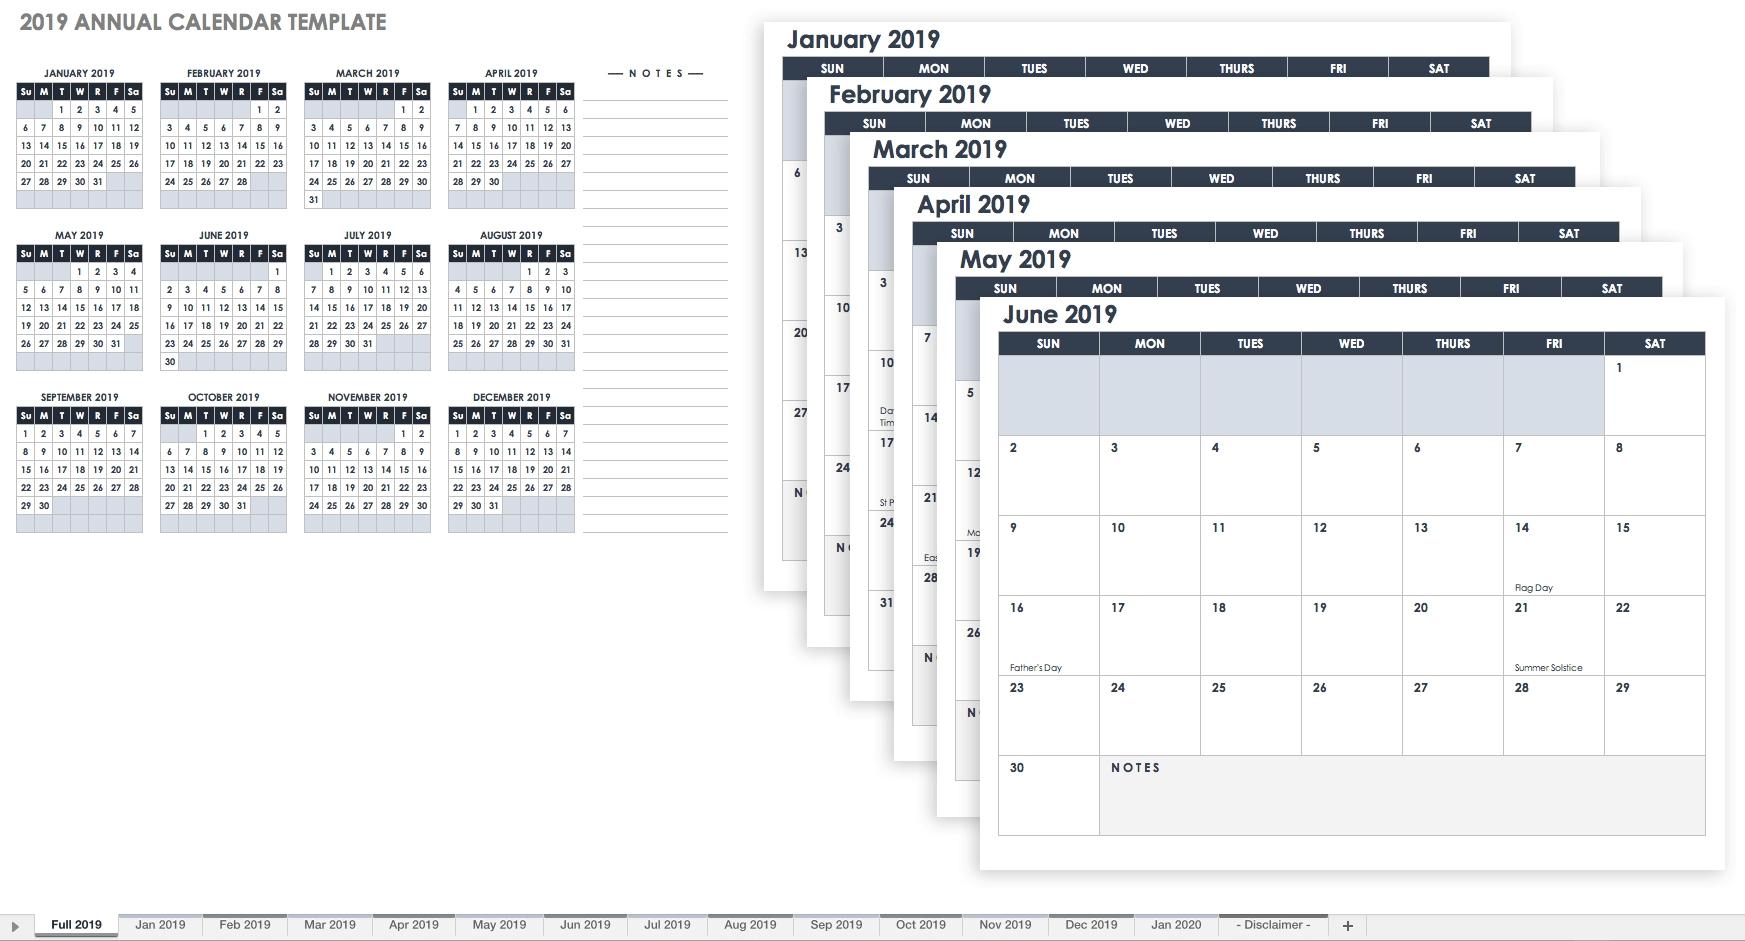 Free Printable 2020 Employee Attendance Calendar - Peri.con-2020 Employee Attendance Template